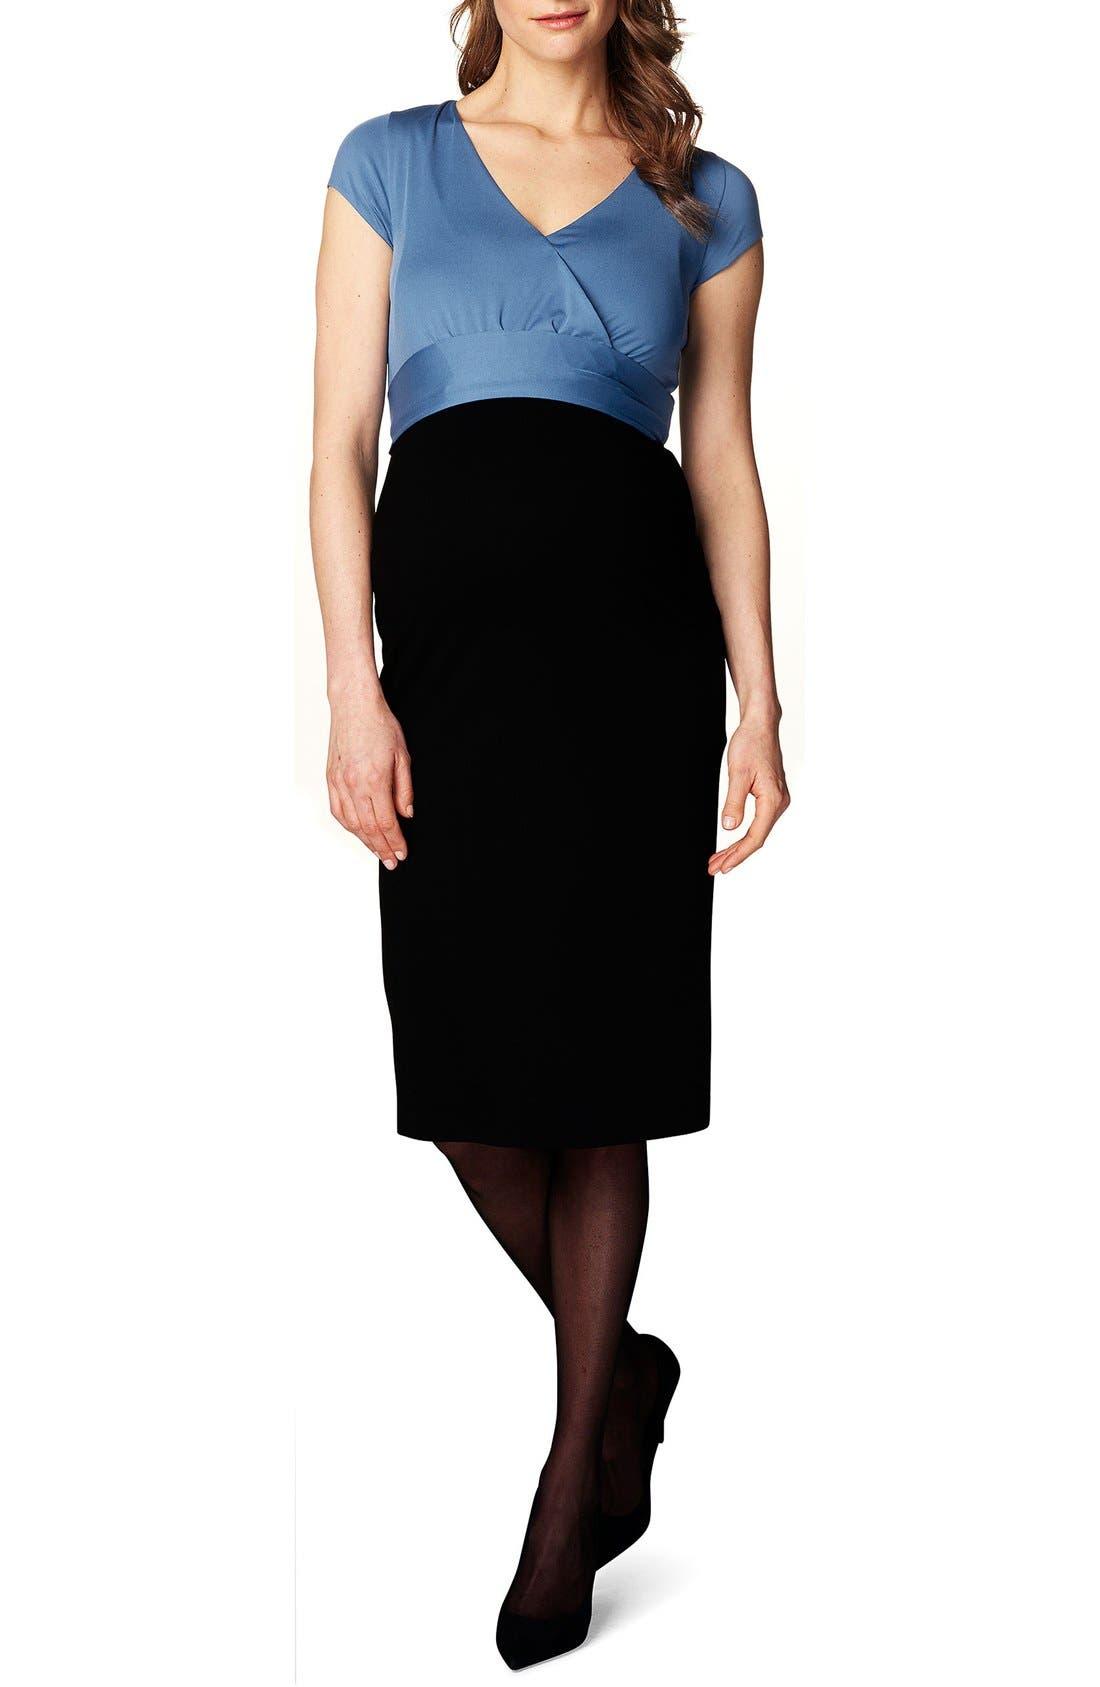 Main Image - Noppies 'Tara' Surplice Maternity Dress